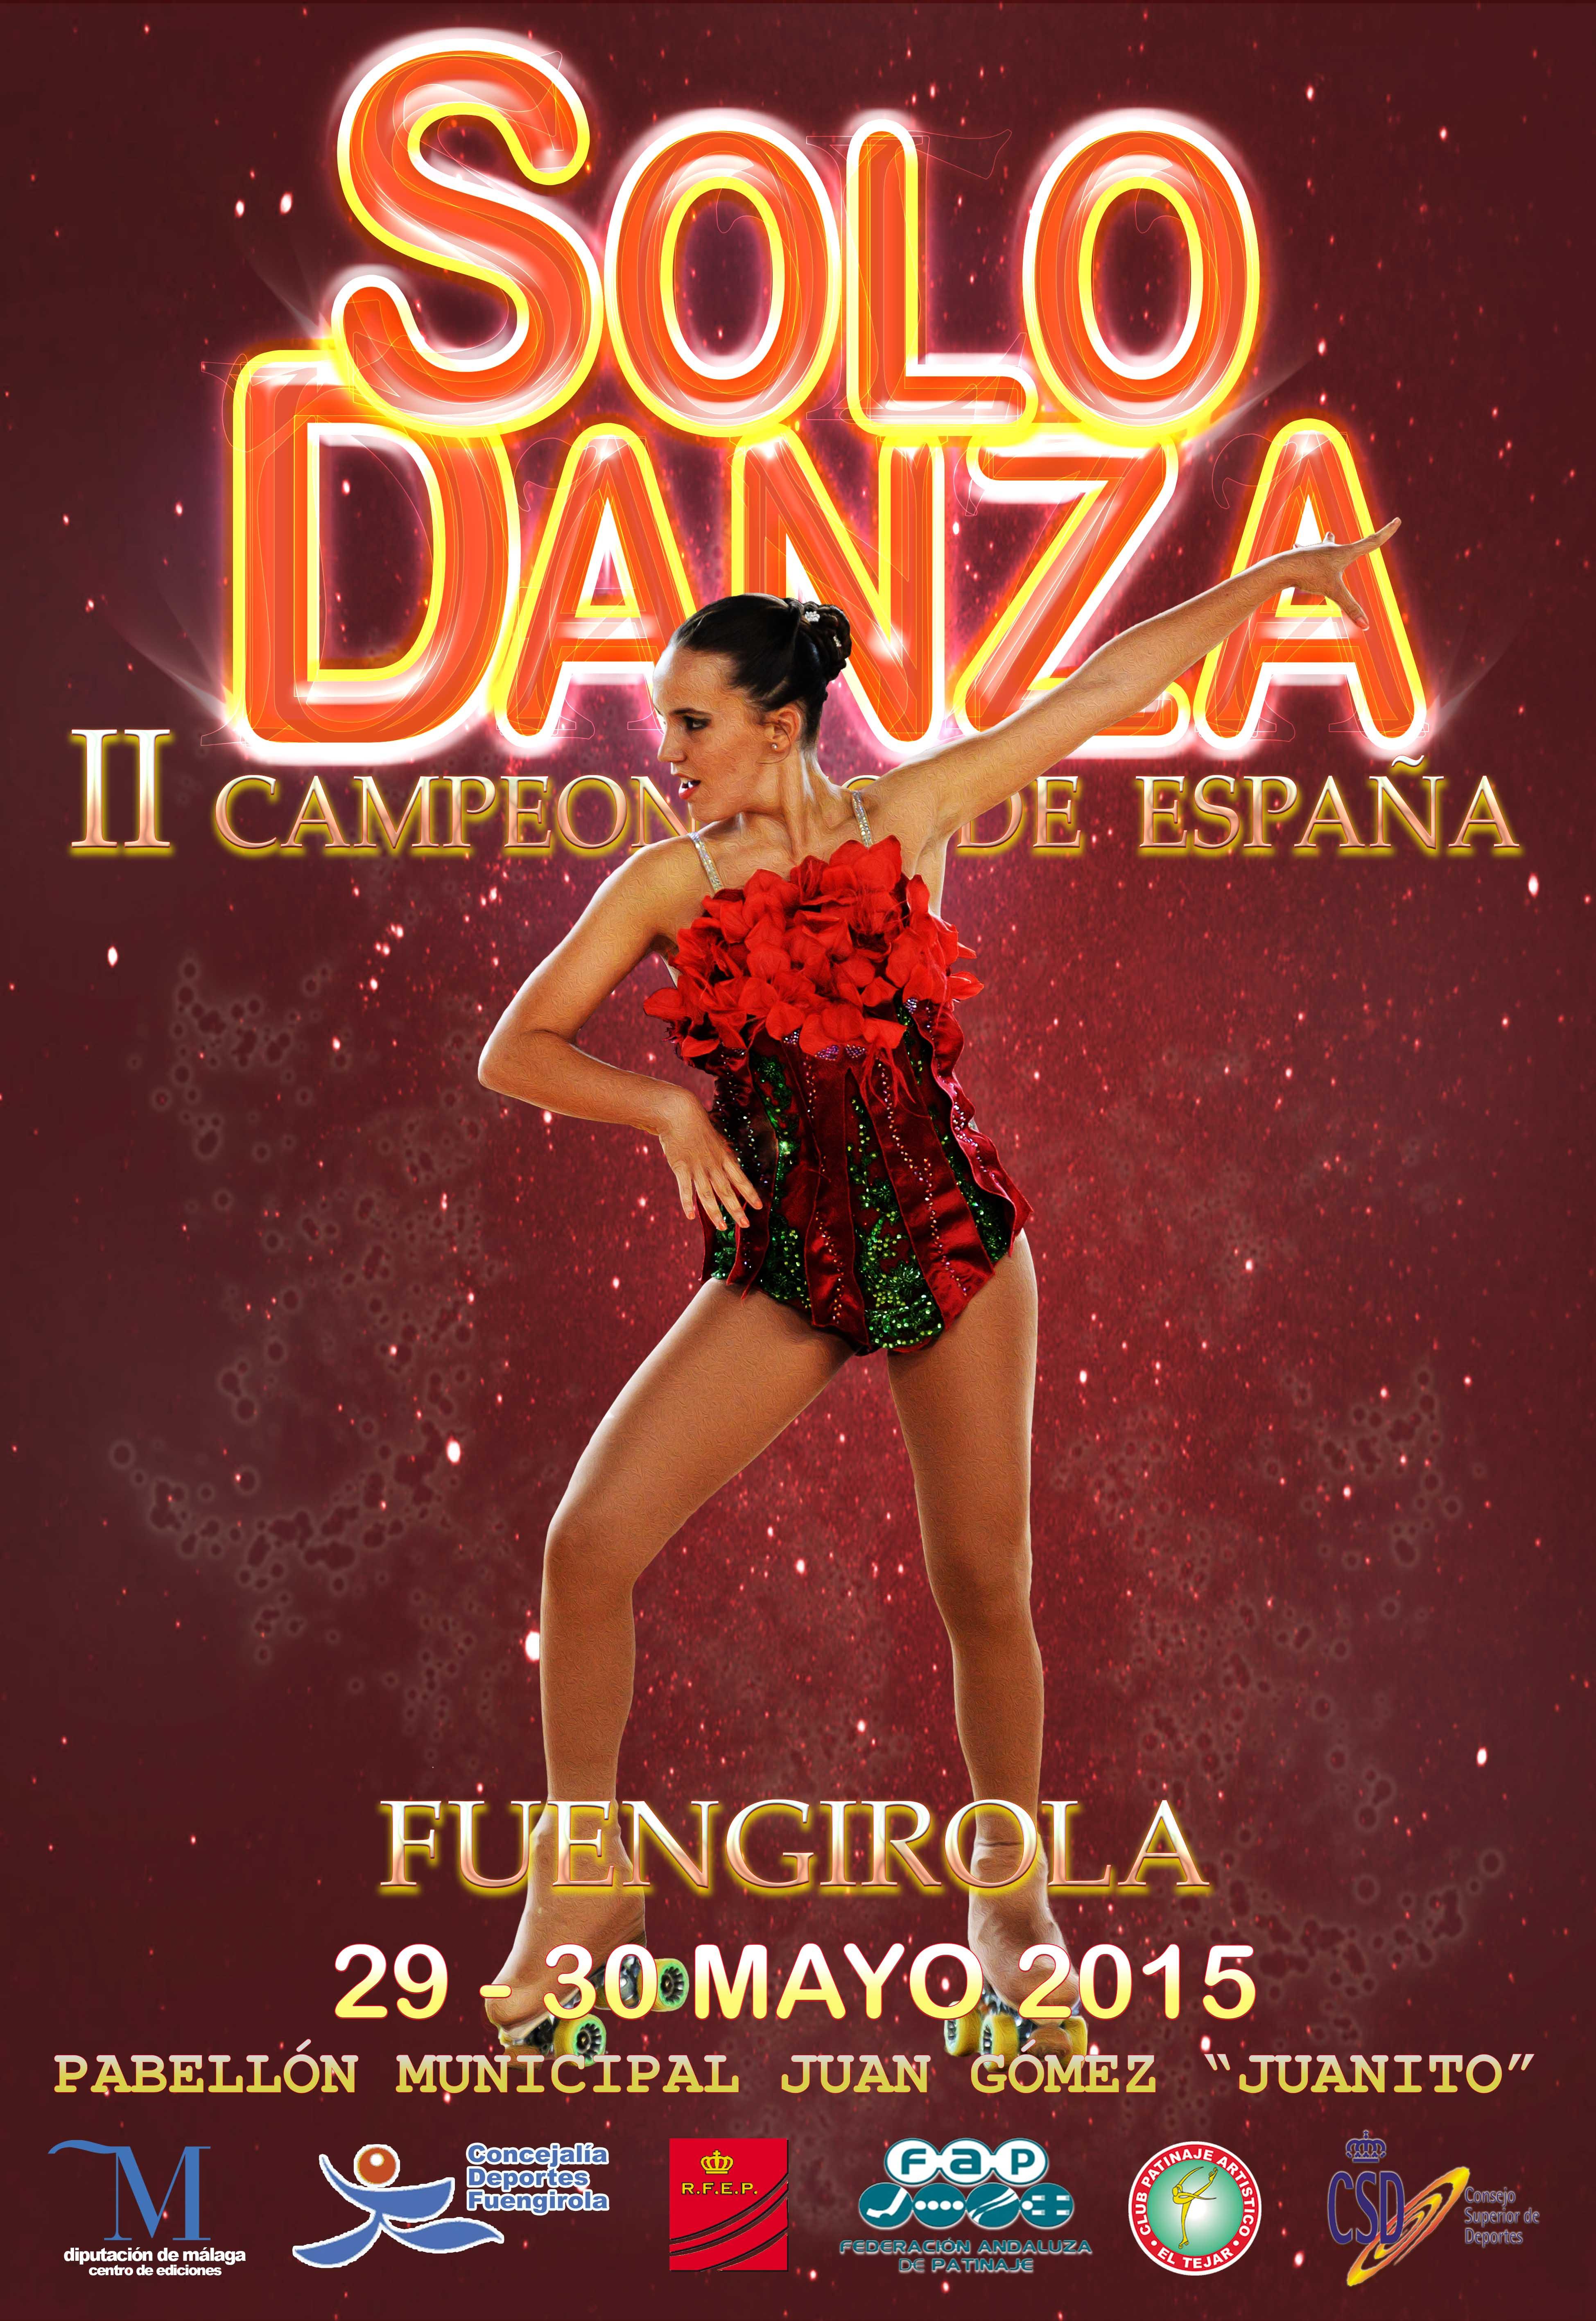 Segundo campeonato de solo danza de fuengirola